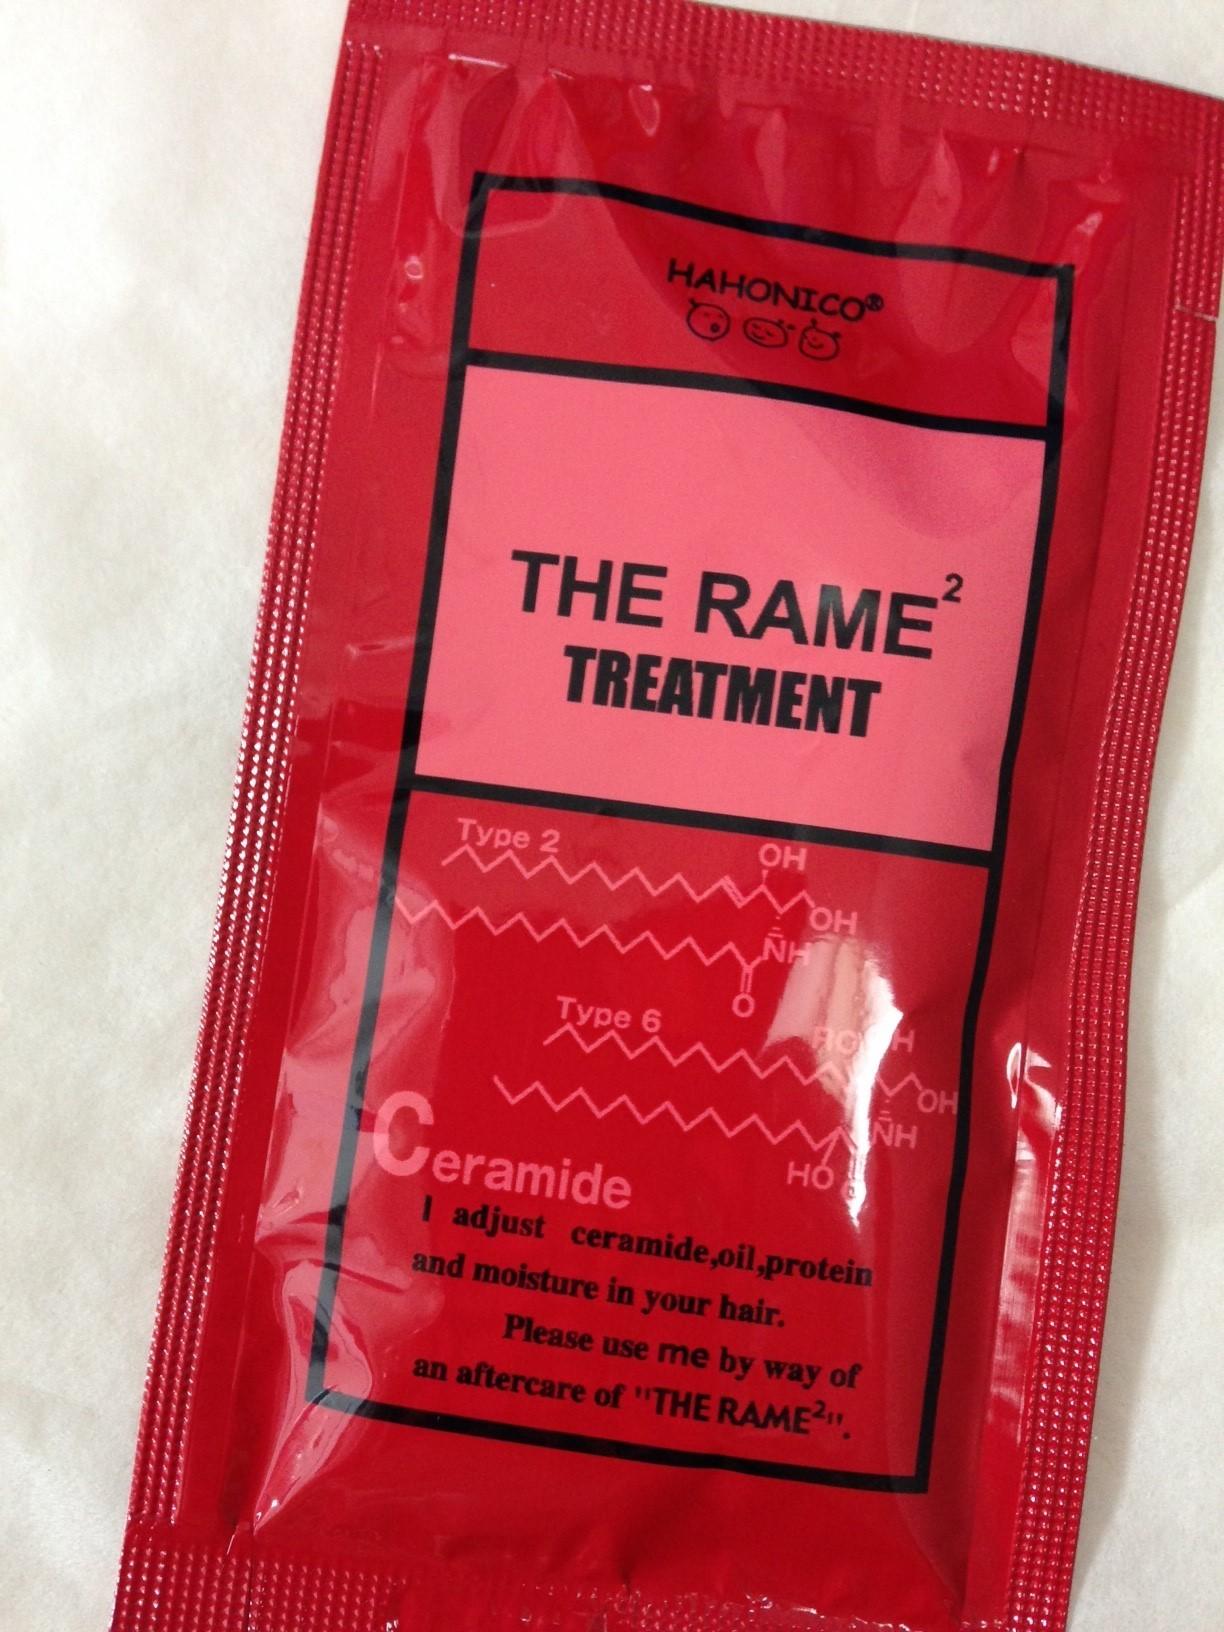 Hahonico_The_Rame2_Treatment.jpg